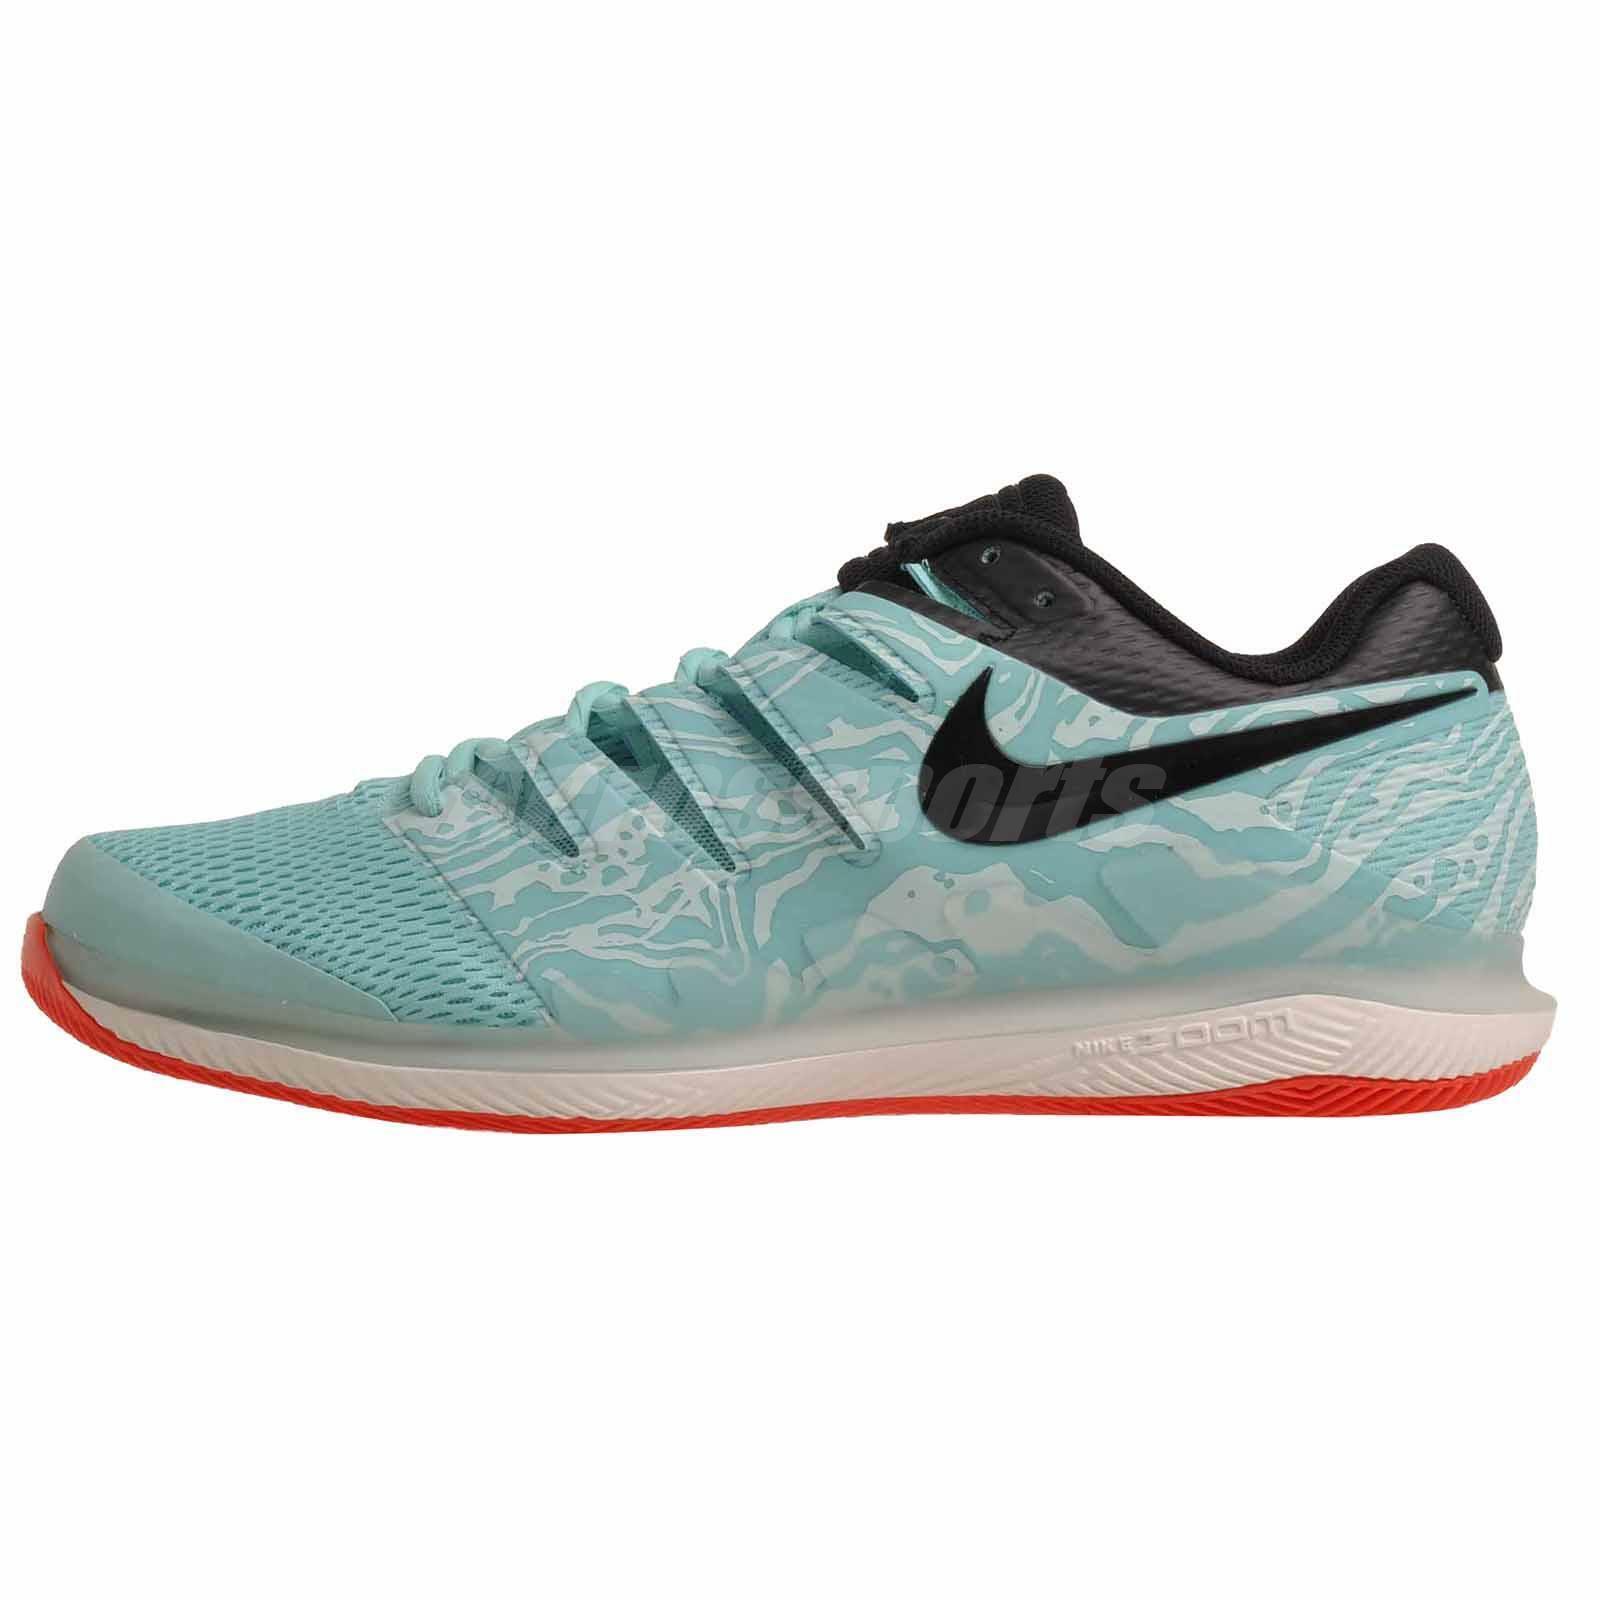 Nike Air Zoom Vapor X HC Tennis  Mens scarpe verde nero AA8030 -301  consegna lampo